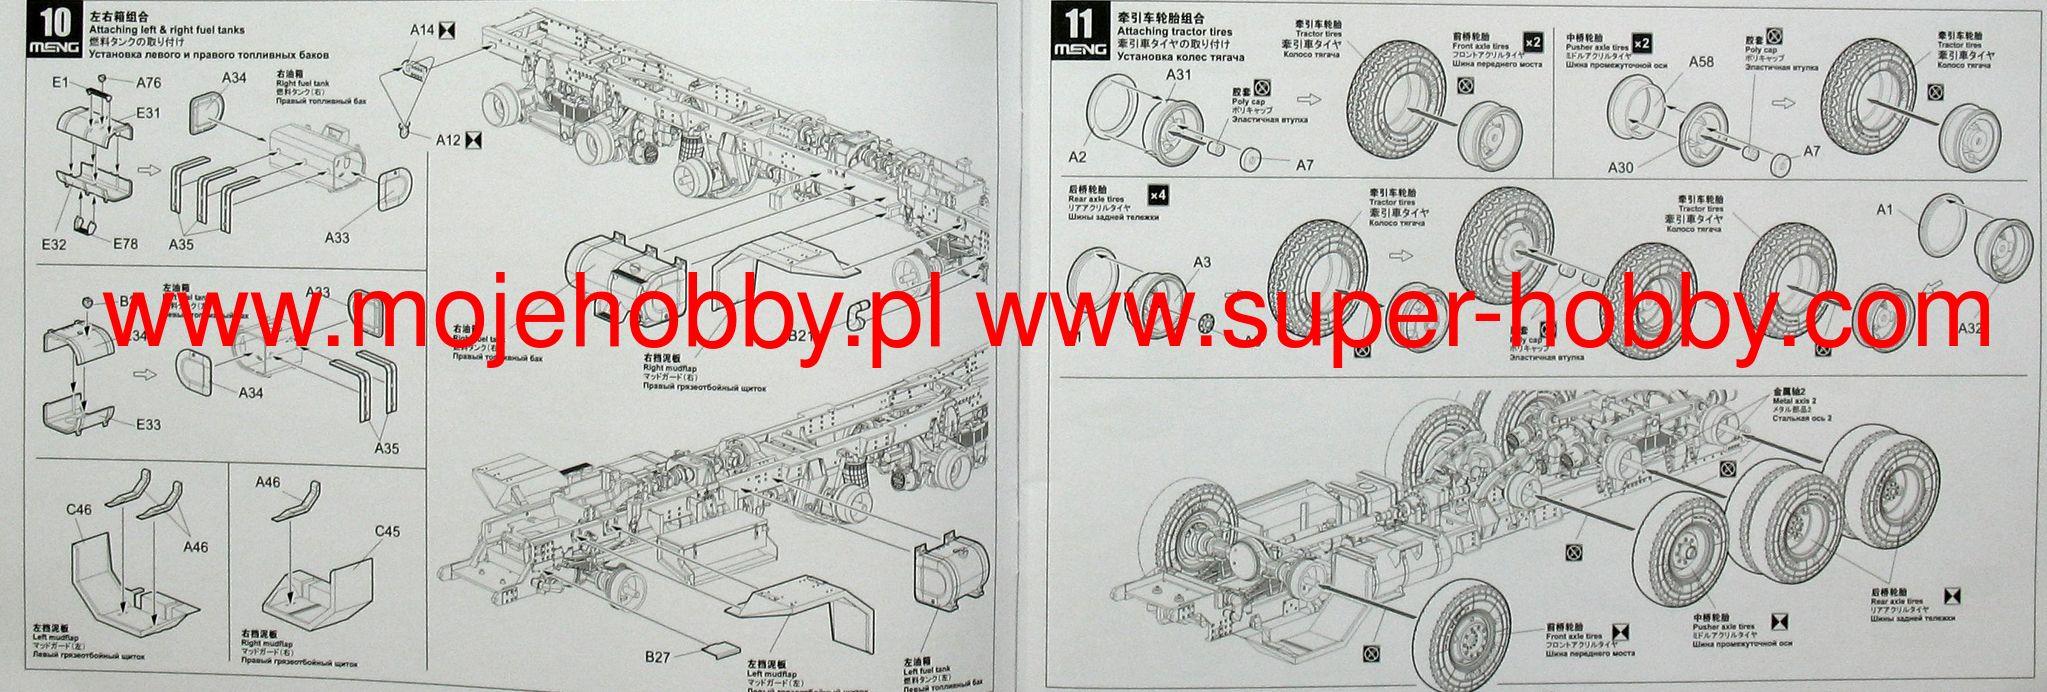 US M911 C-HET (8x6) & M747 Heavy Equipment Semi-Trailer Meng Model SS013